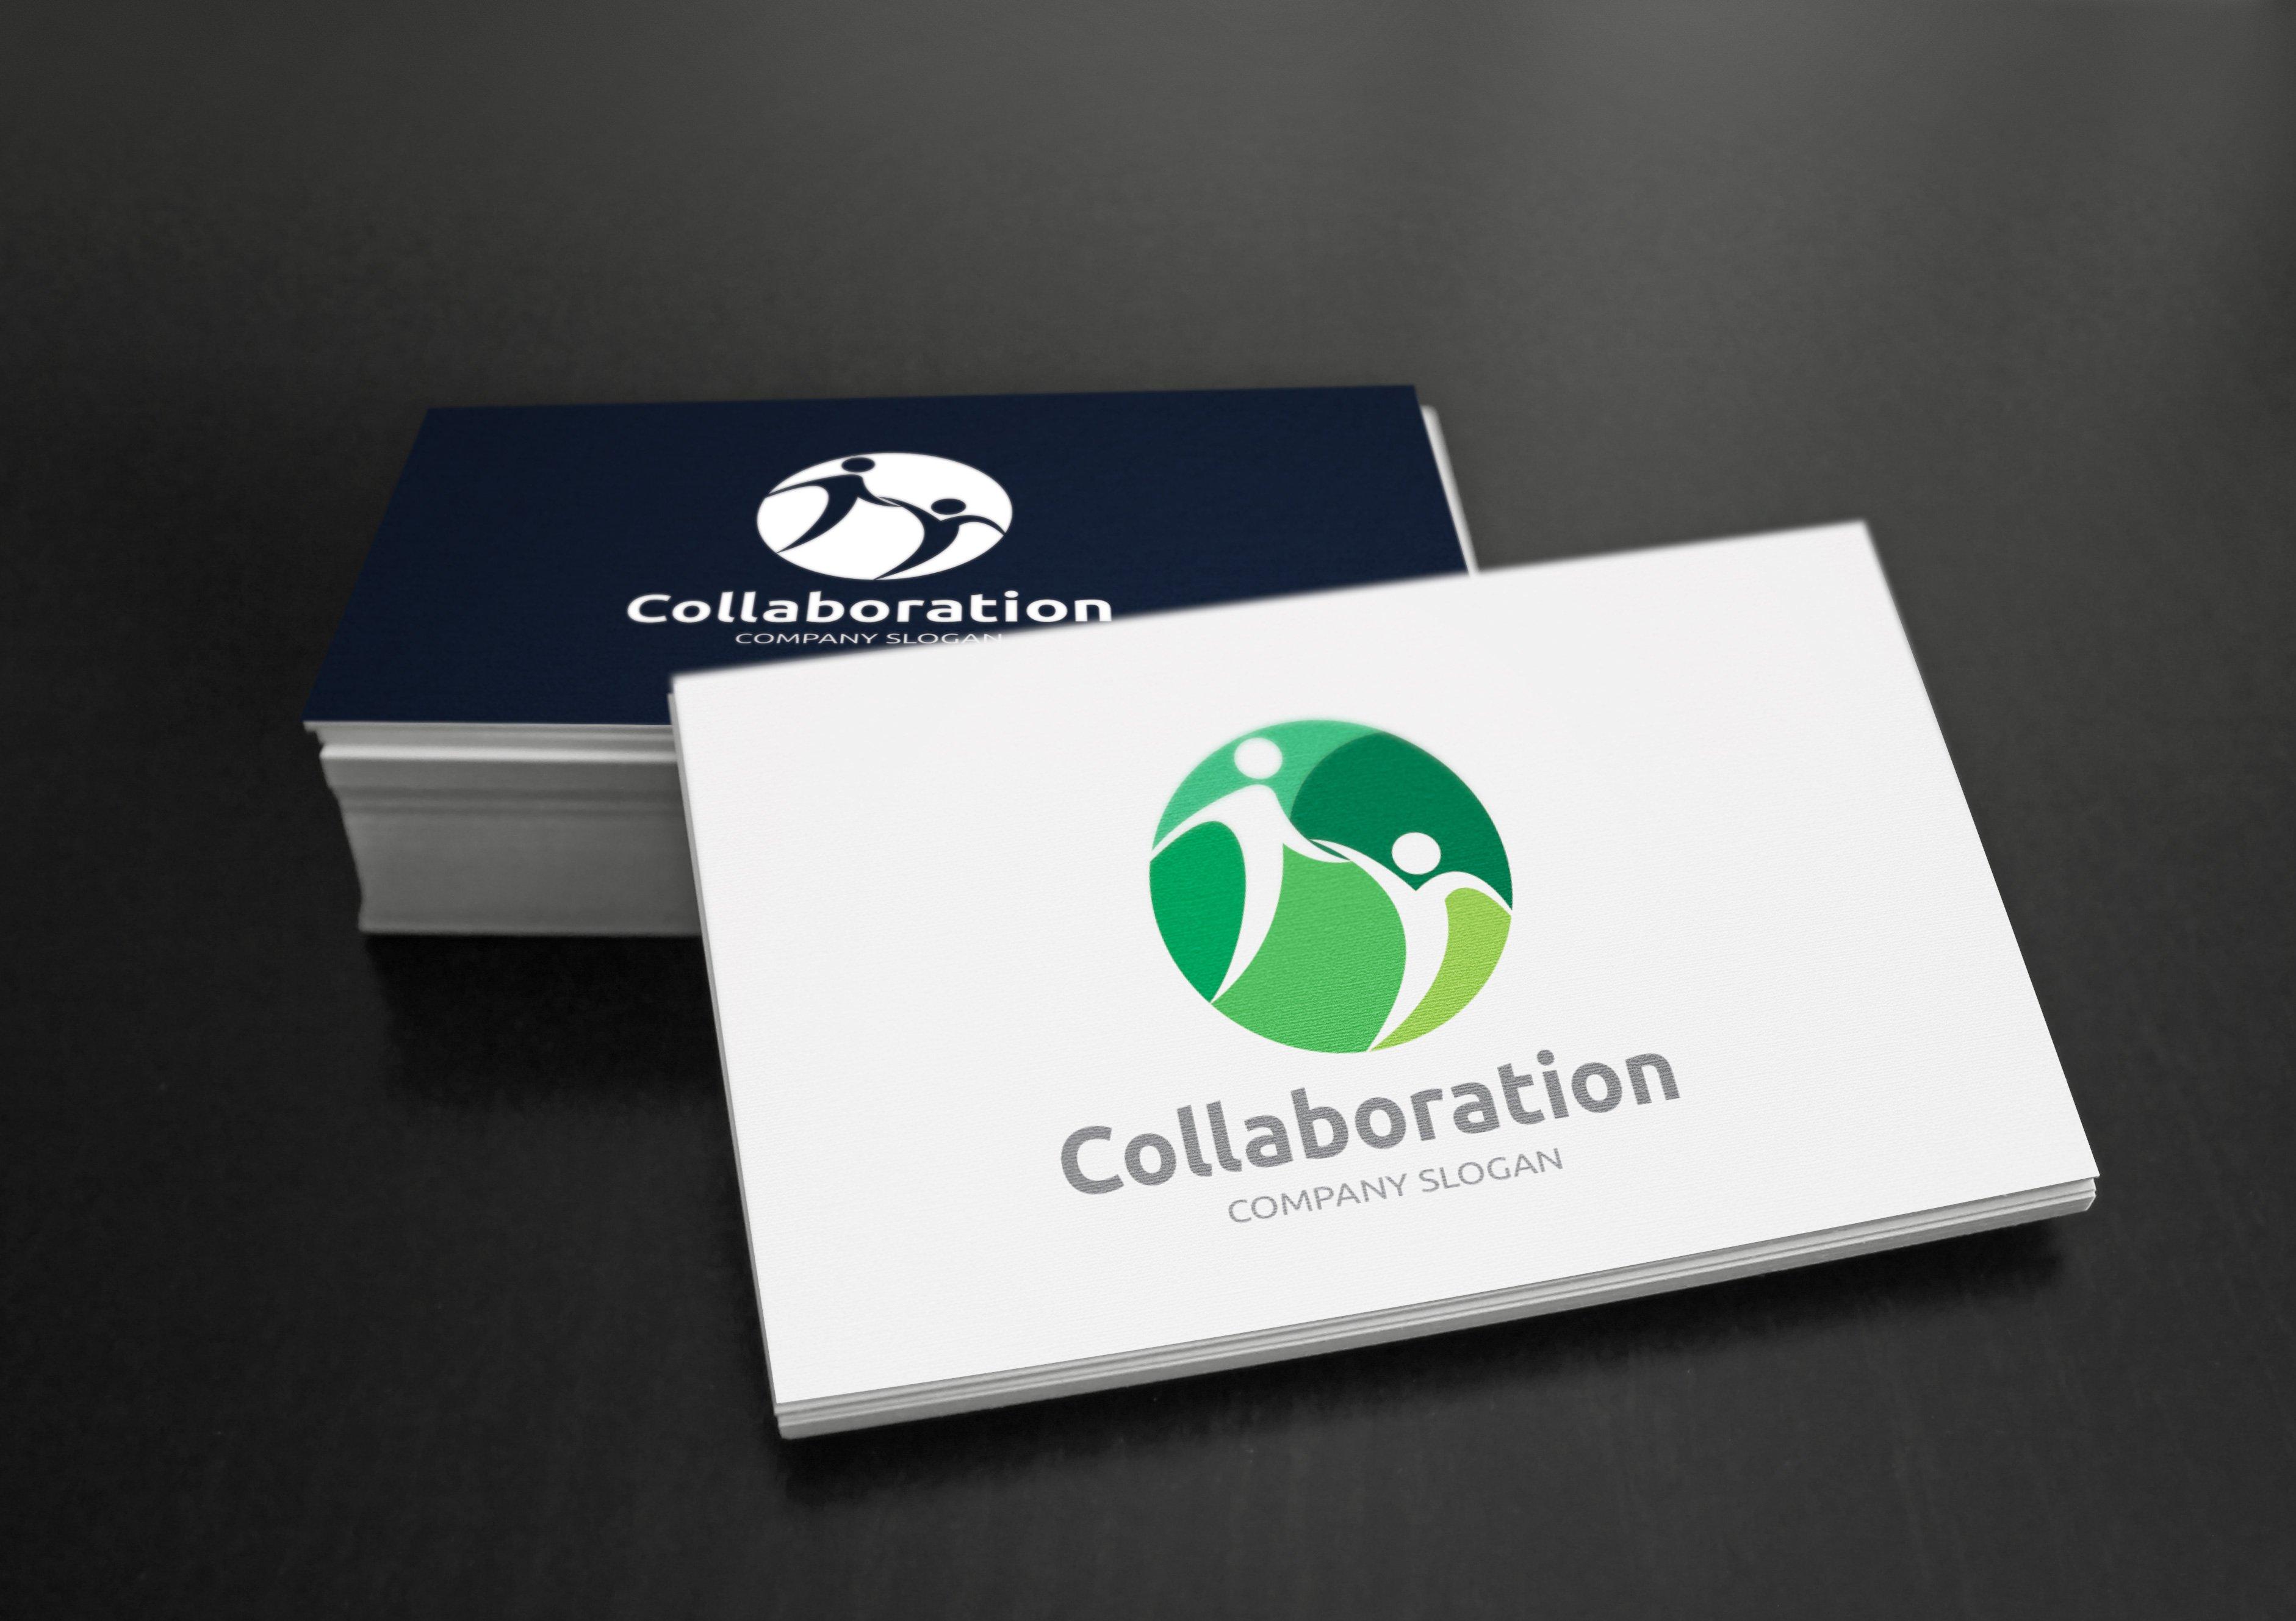 collaboration logo logo templates creative market. Black Bedroom Furniture Sets. Home Design Ideas